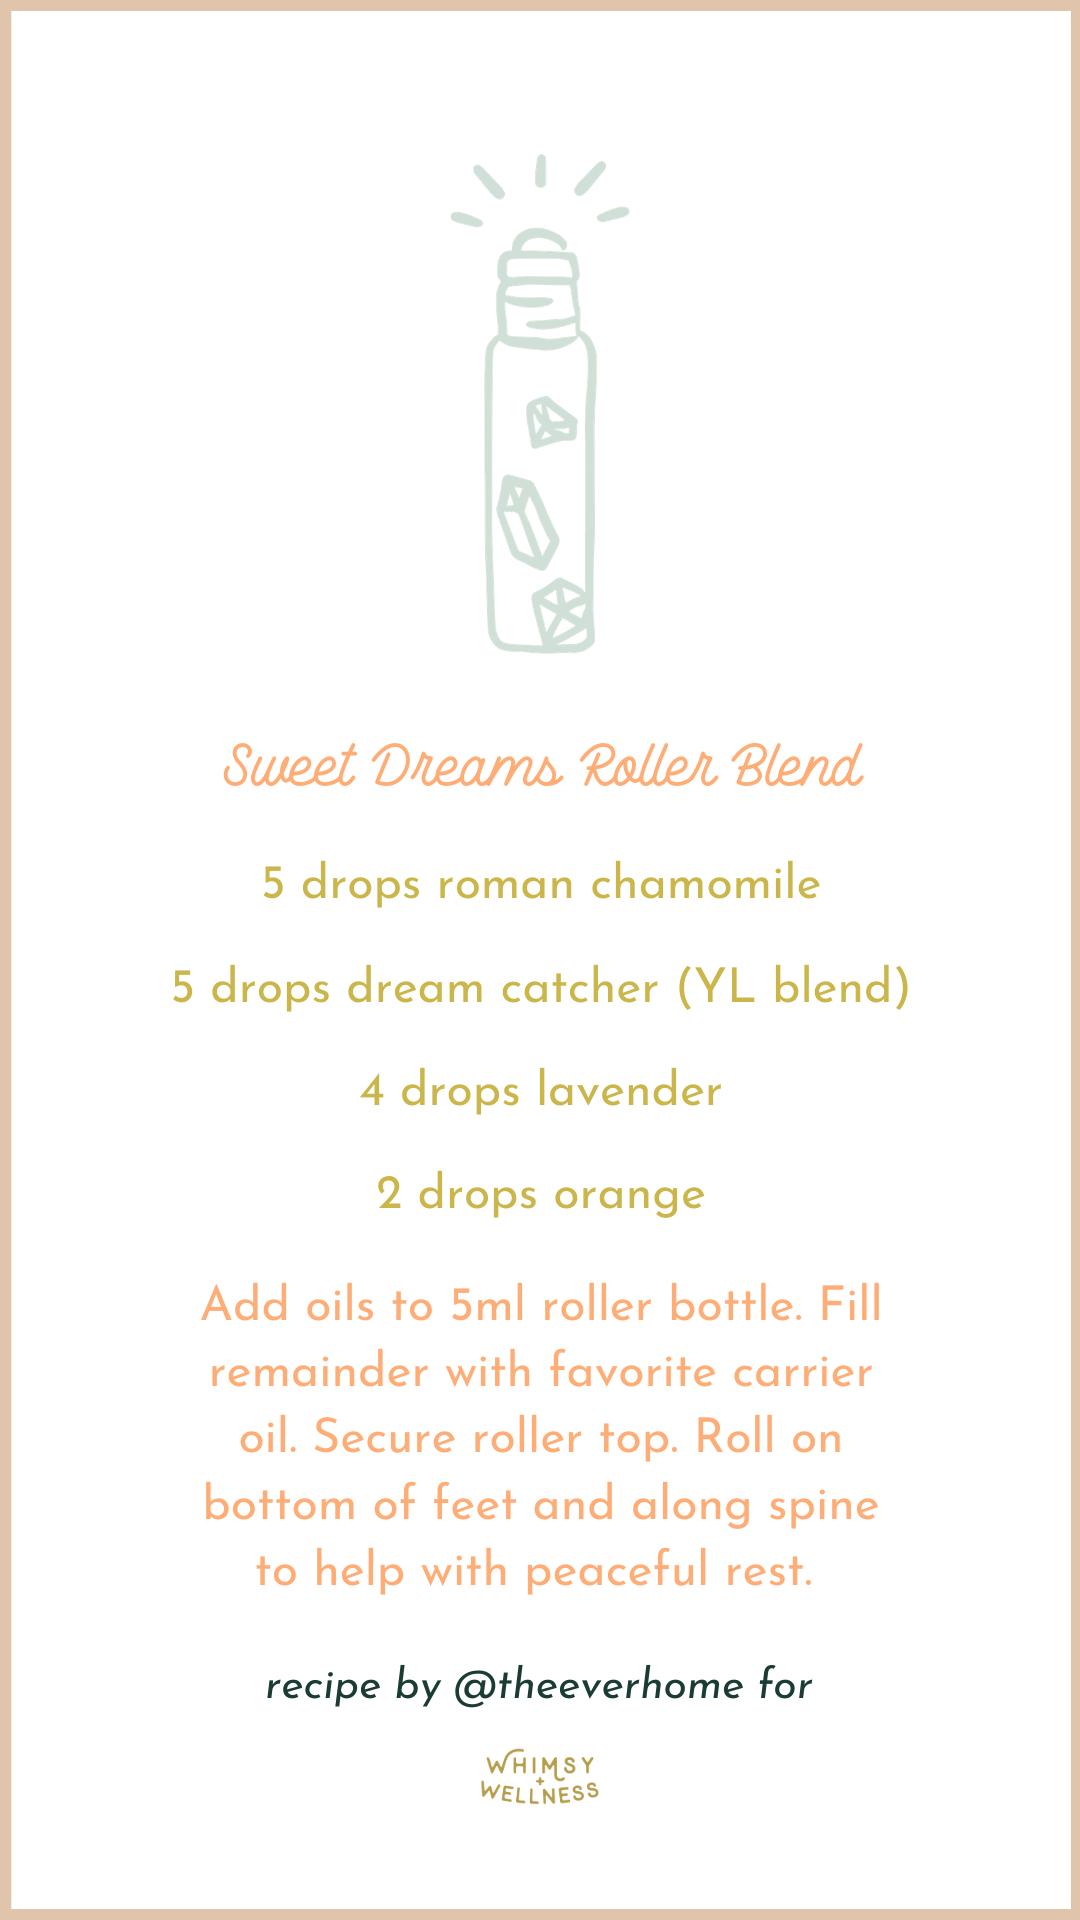 Sweet Dreams Roller Bottle Blend for essential oils Whimsy + Wellness